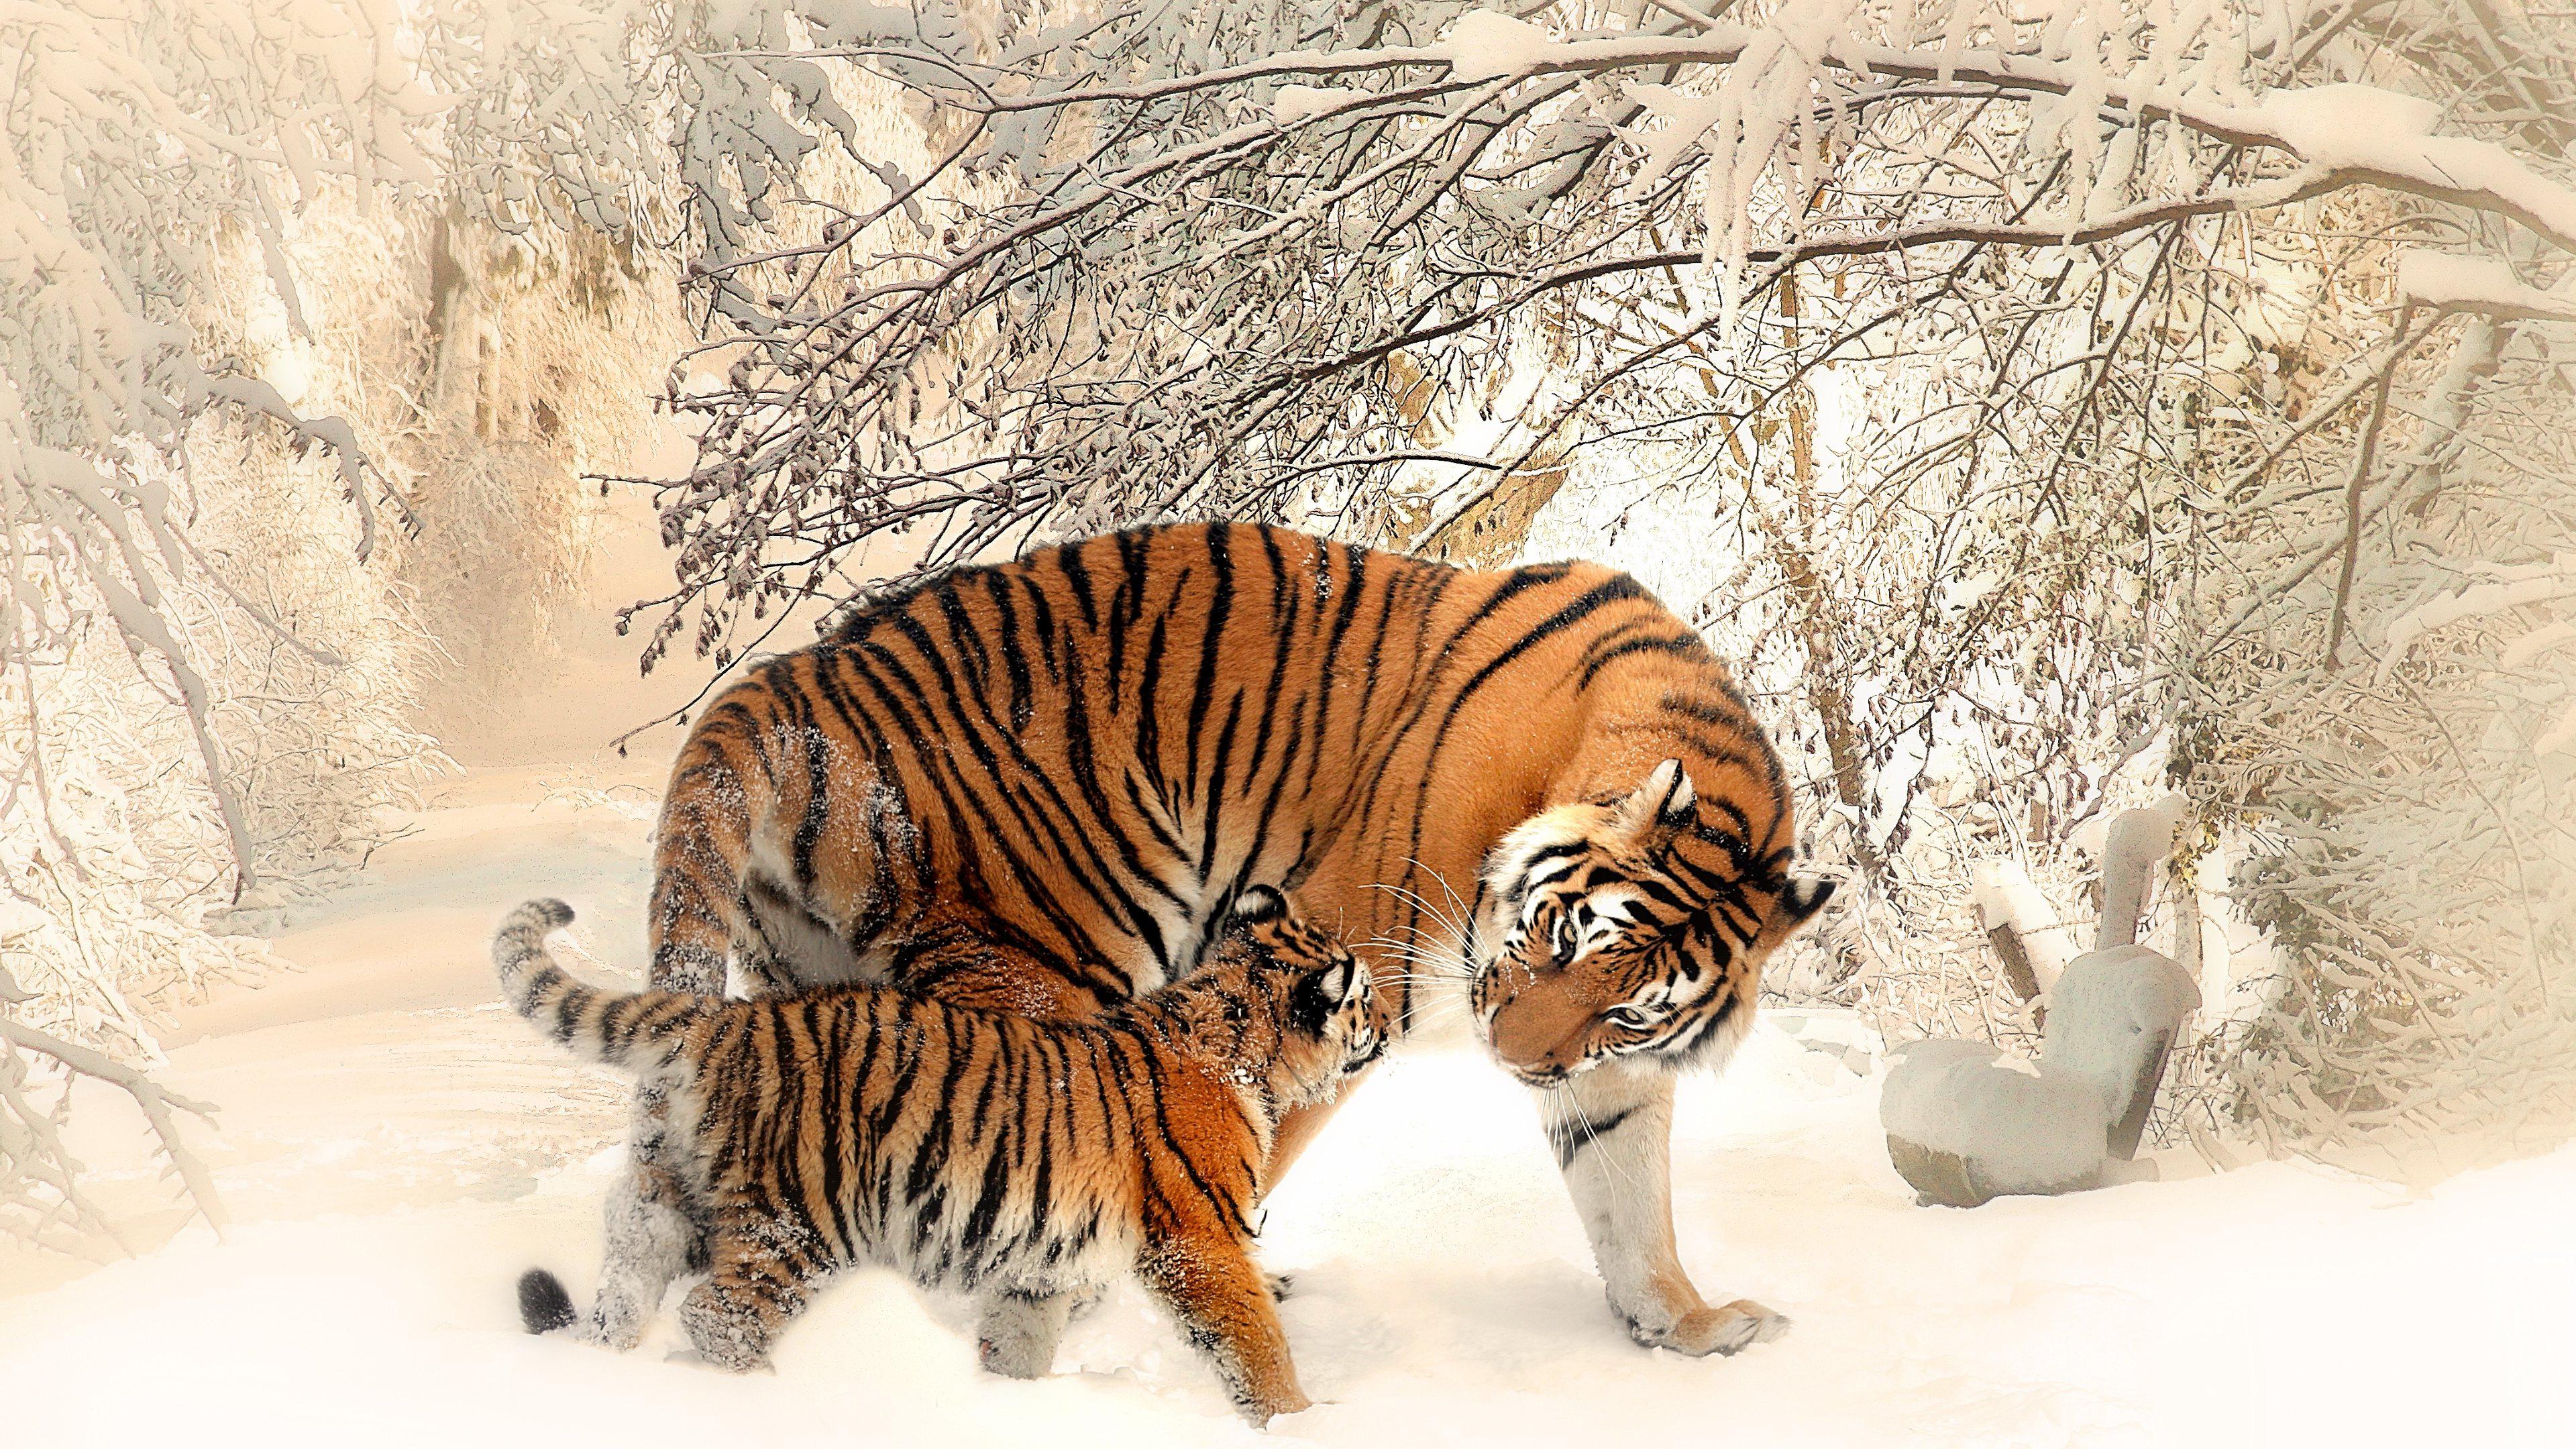 Baby Snow Tiger Wallpaper